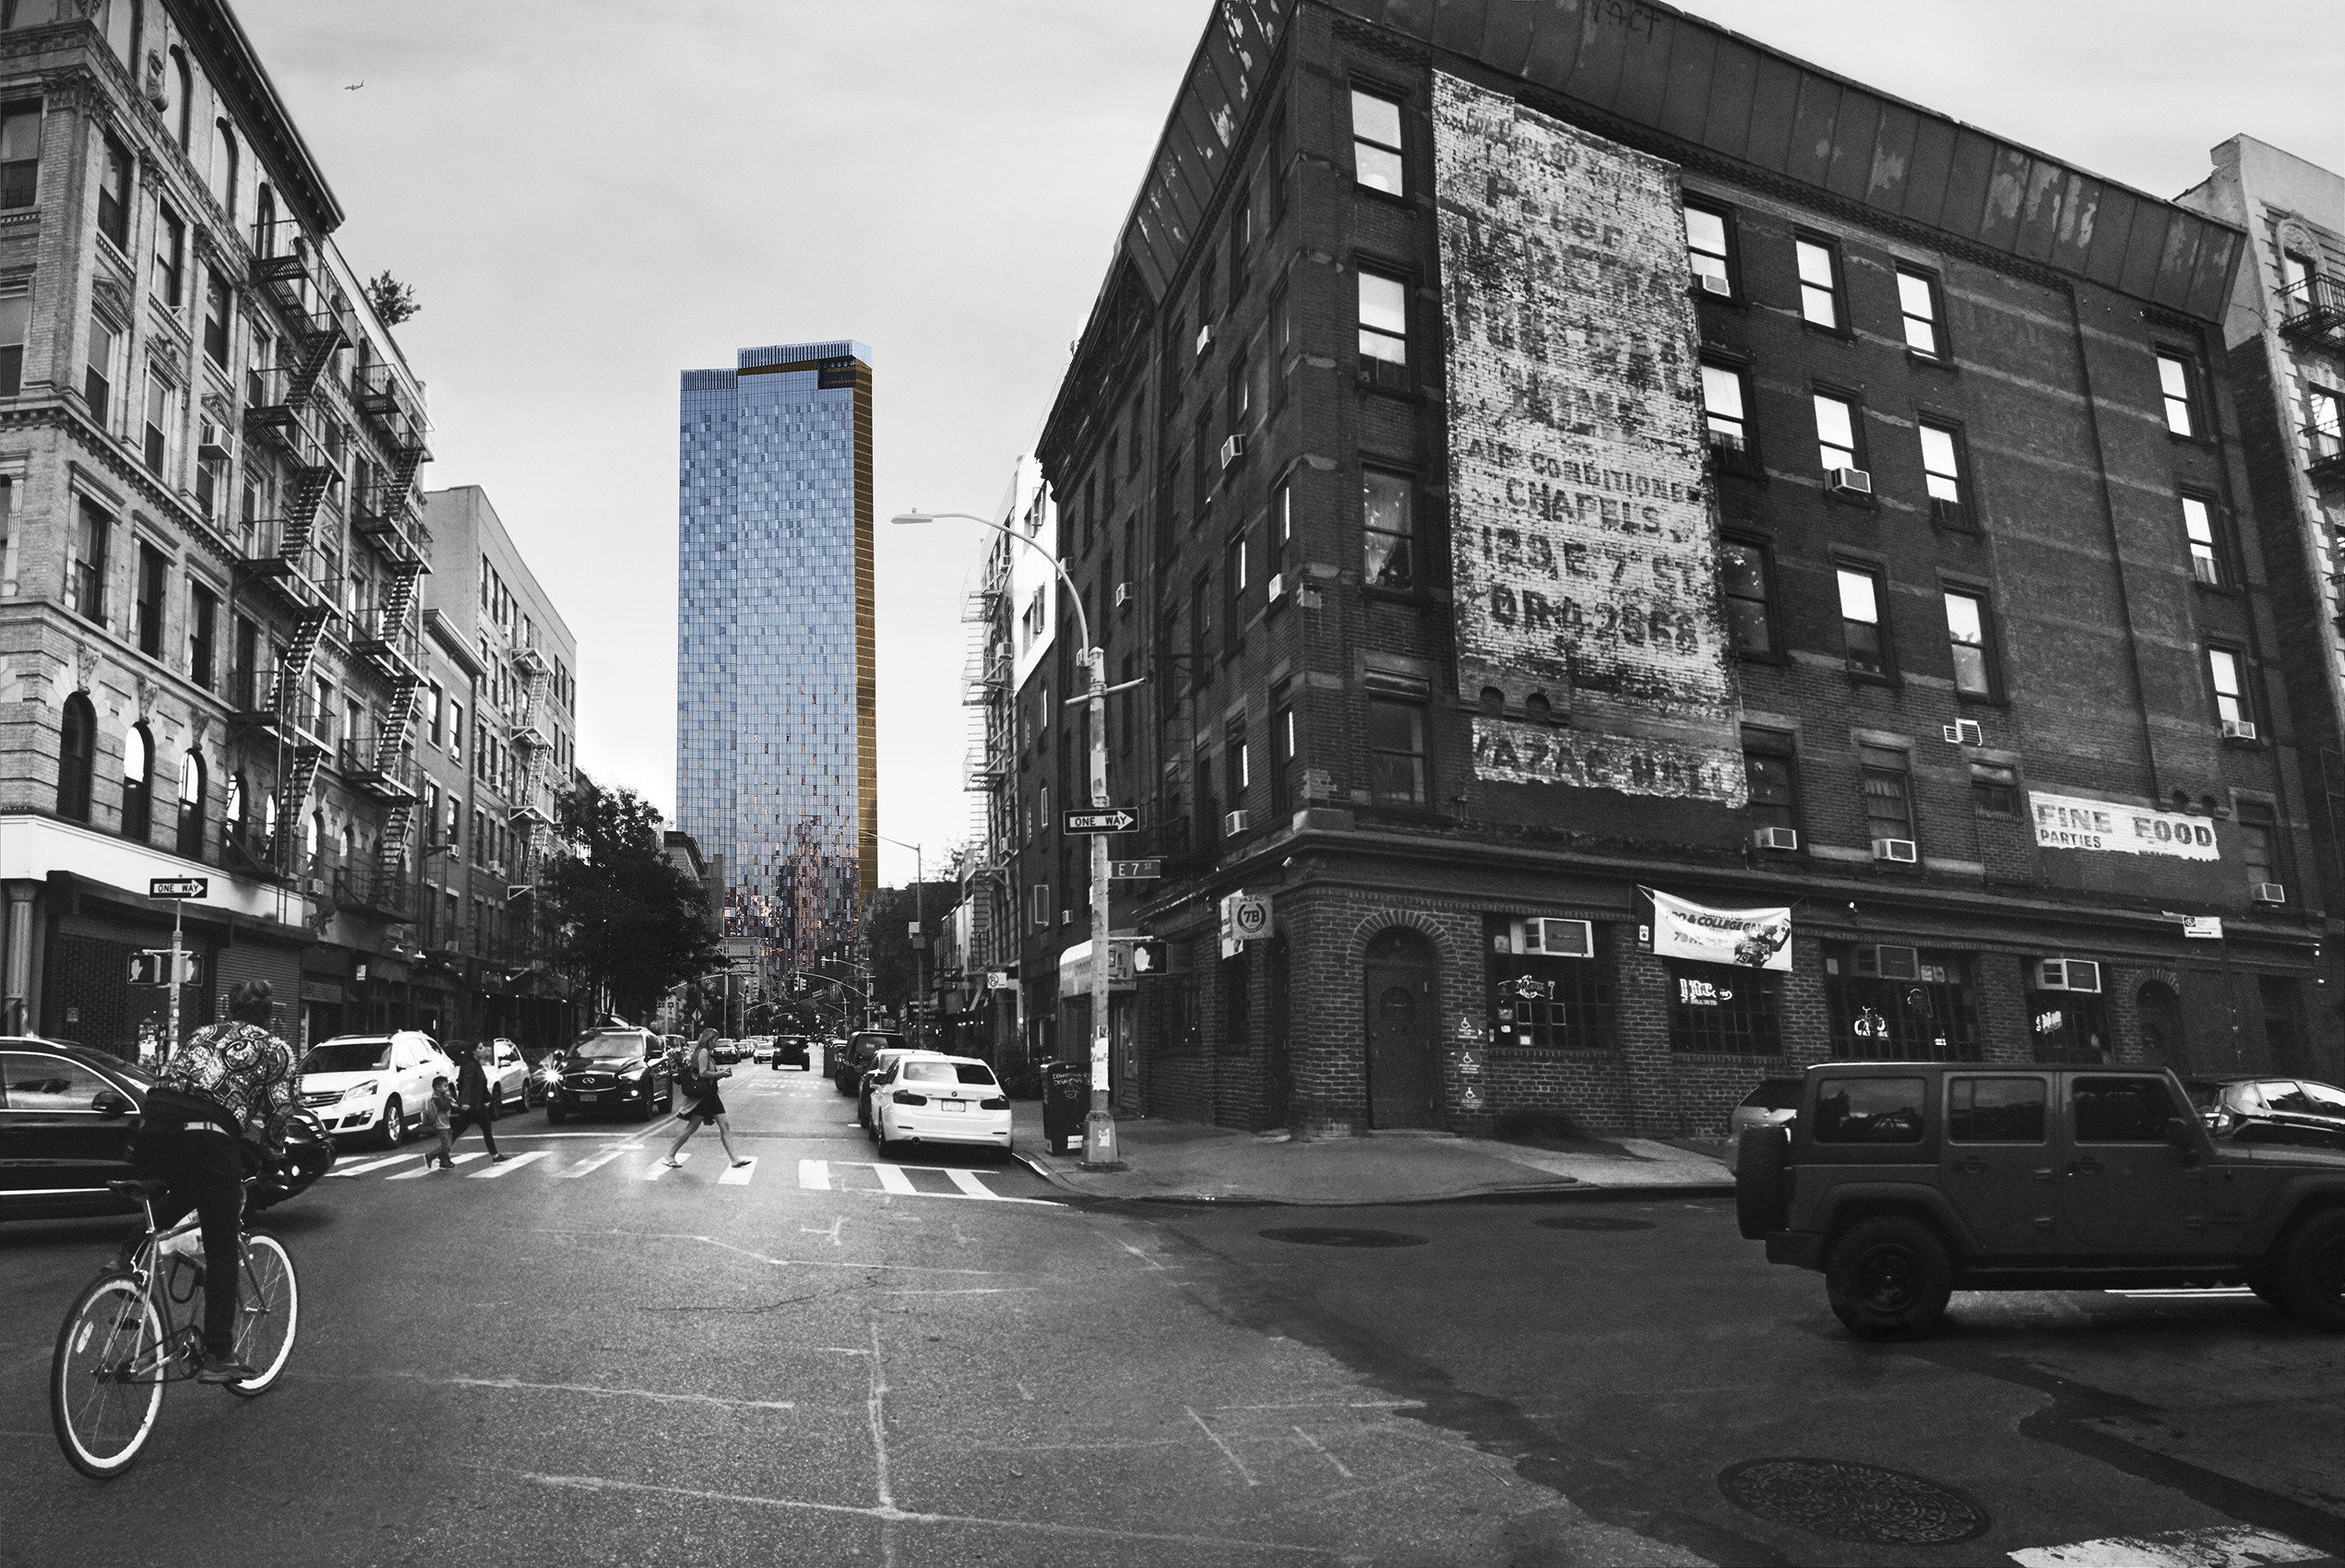 252 South Street, Lower East Side, New York